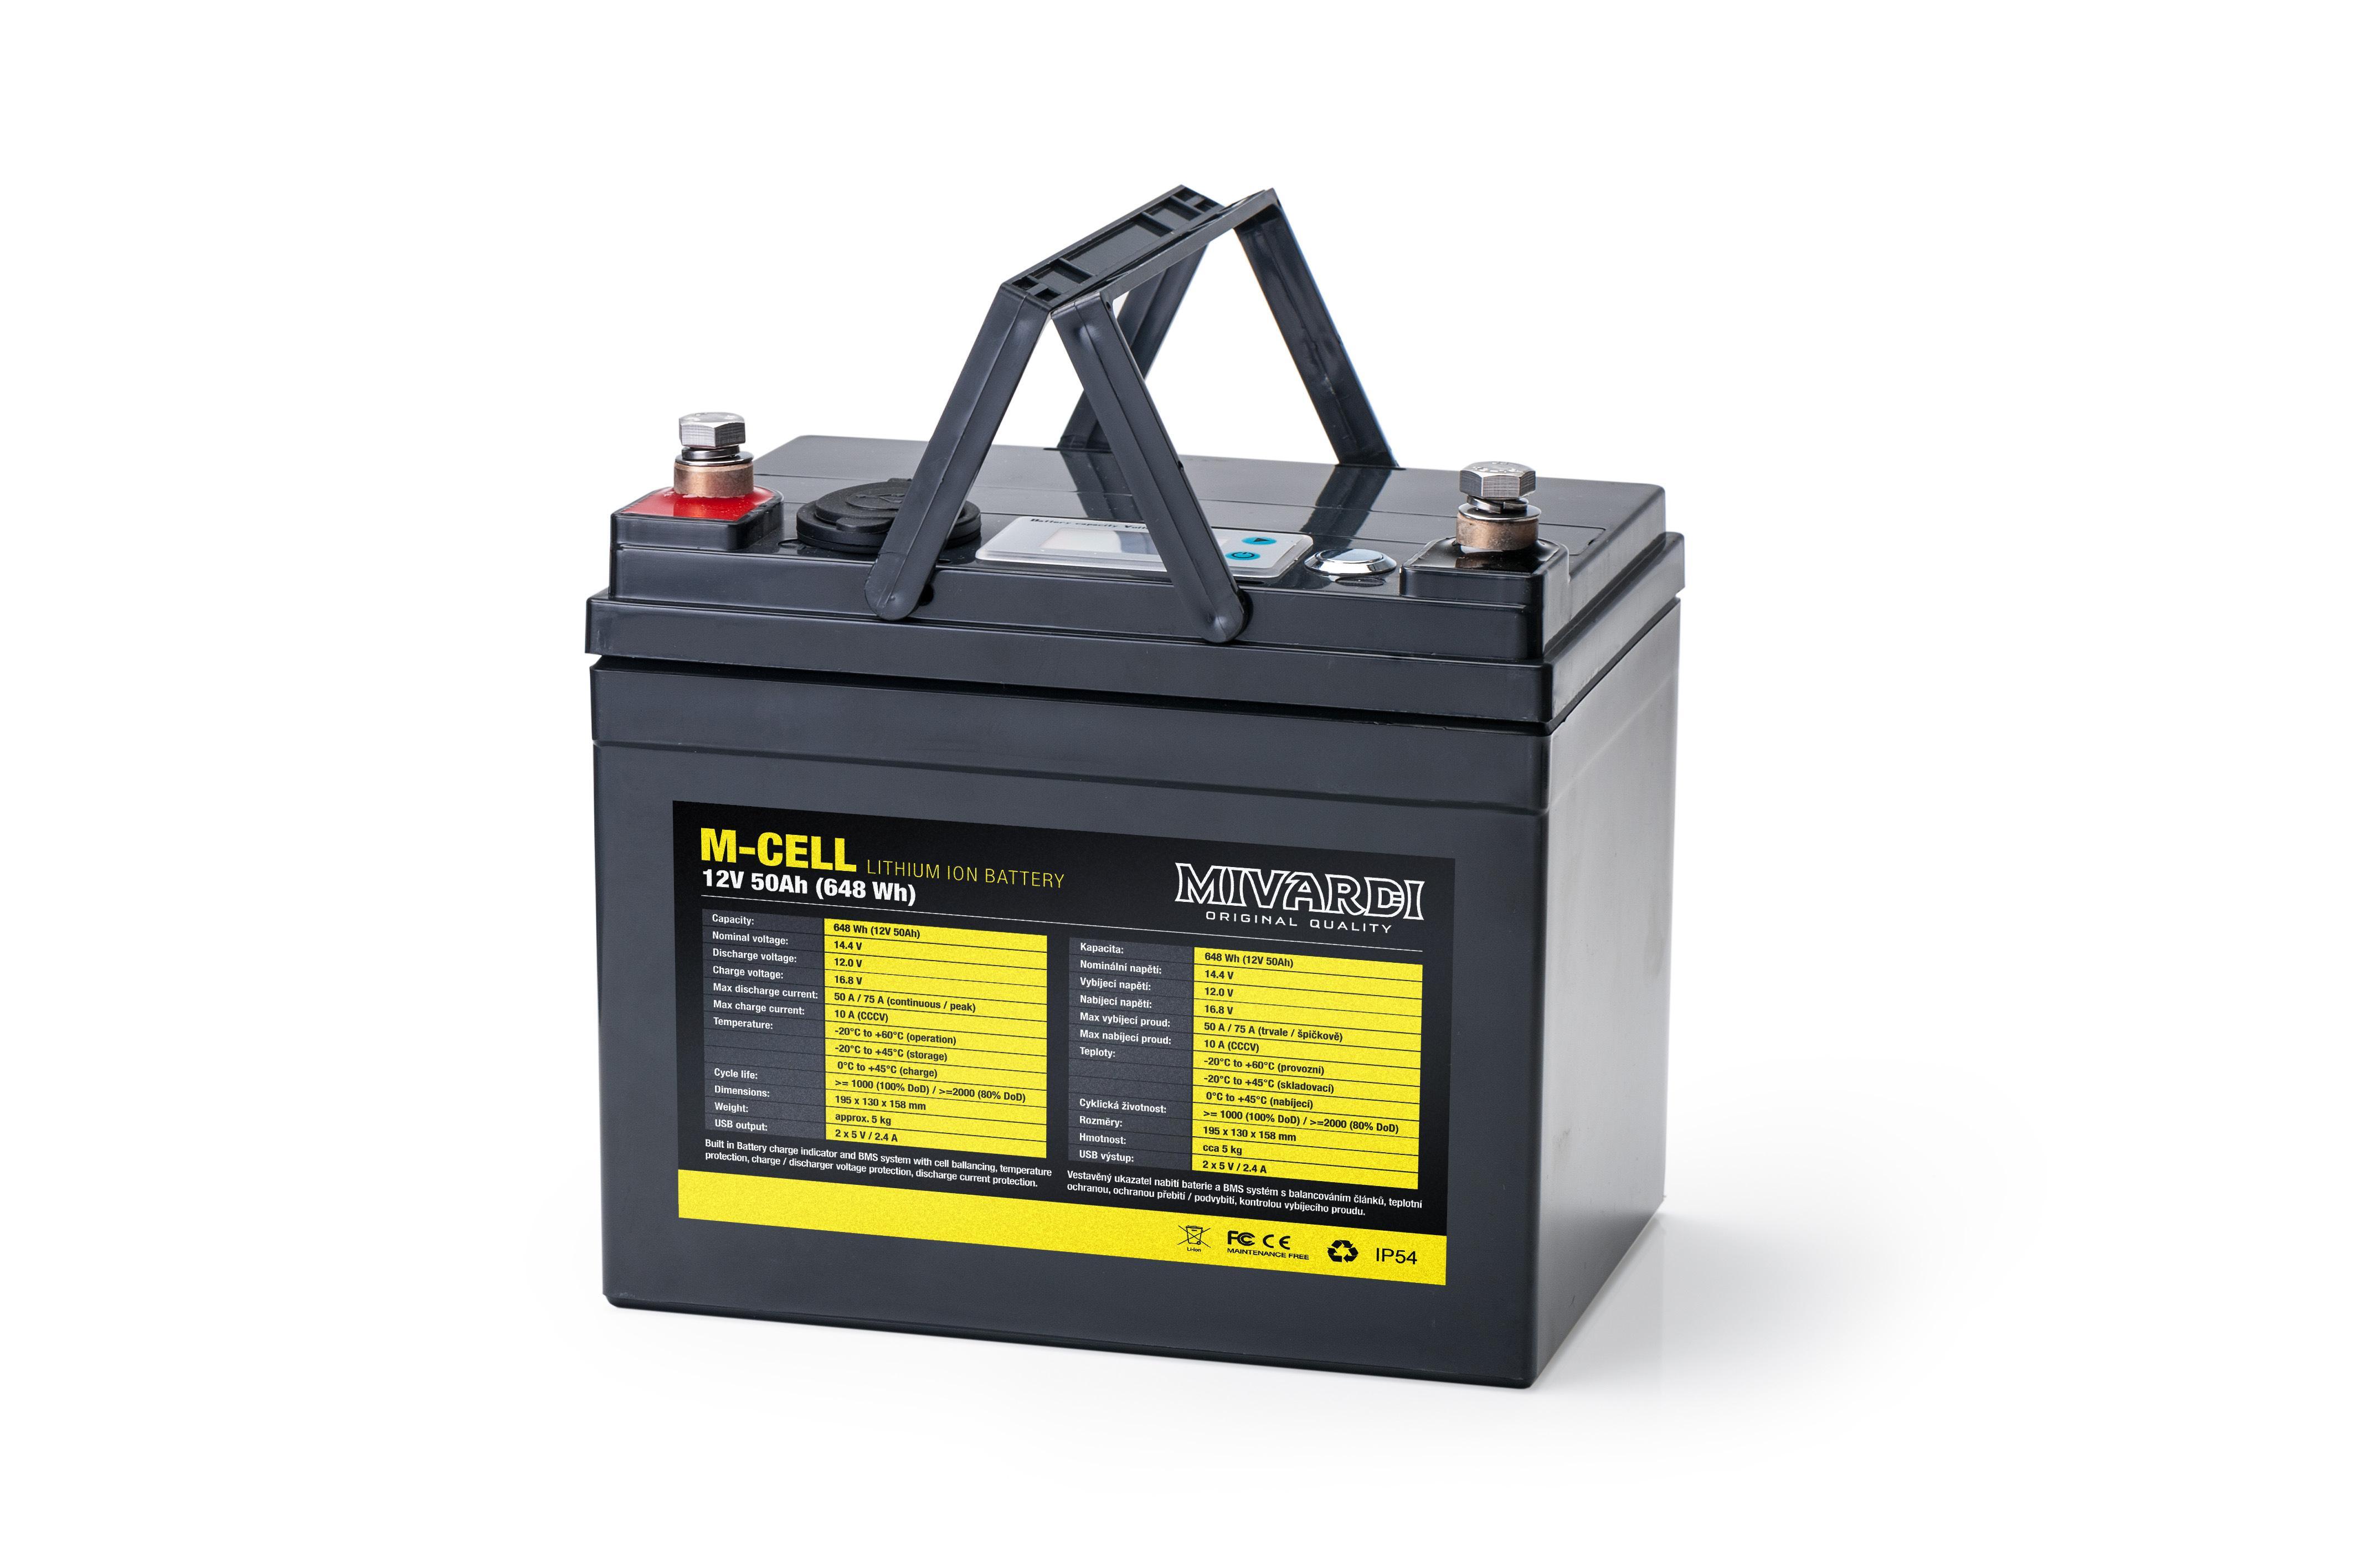 Mivardi Lithiový akumulátor M-CELL 12V 50Ah + 10A nabíjačka